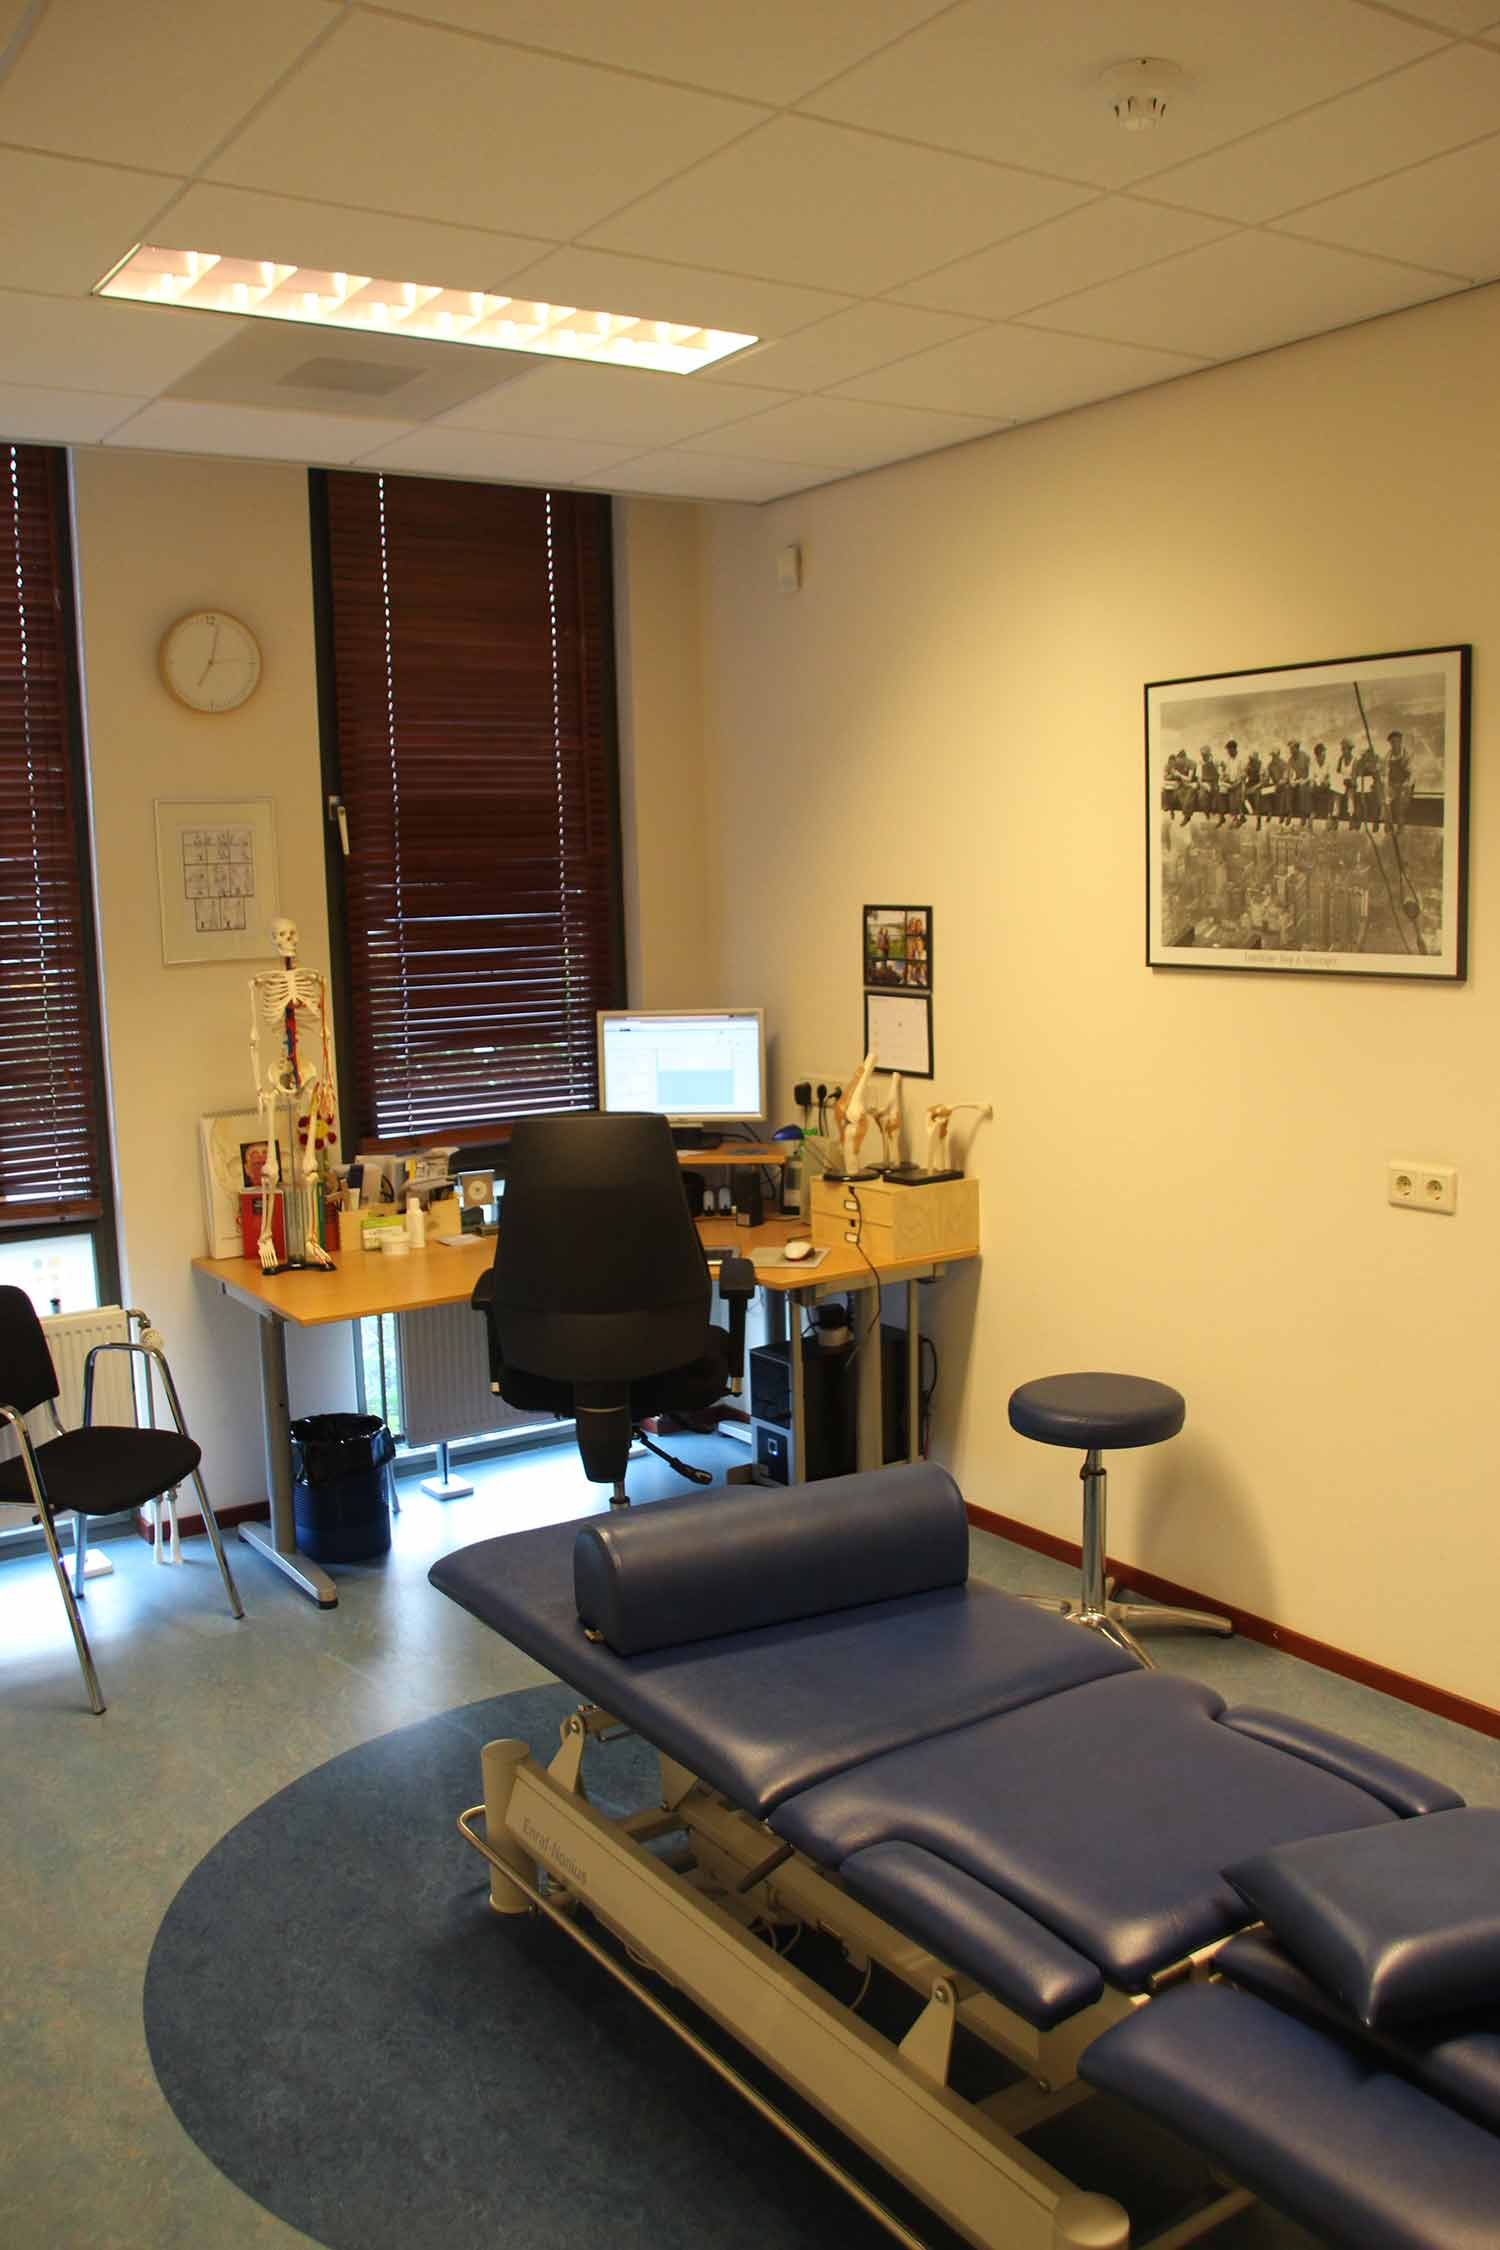 Fysi_osten_fysiotherapeut-Weidevenne